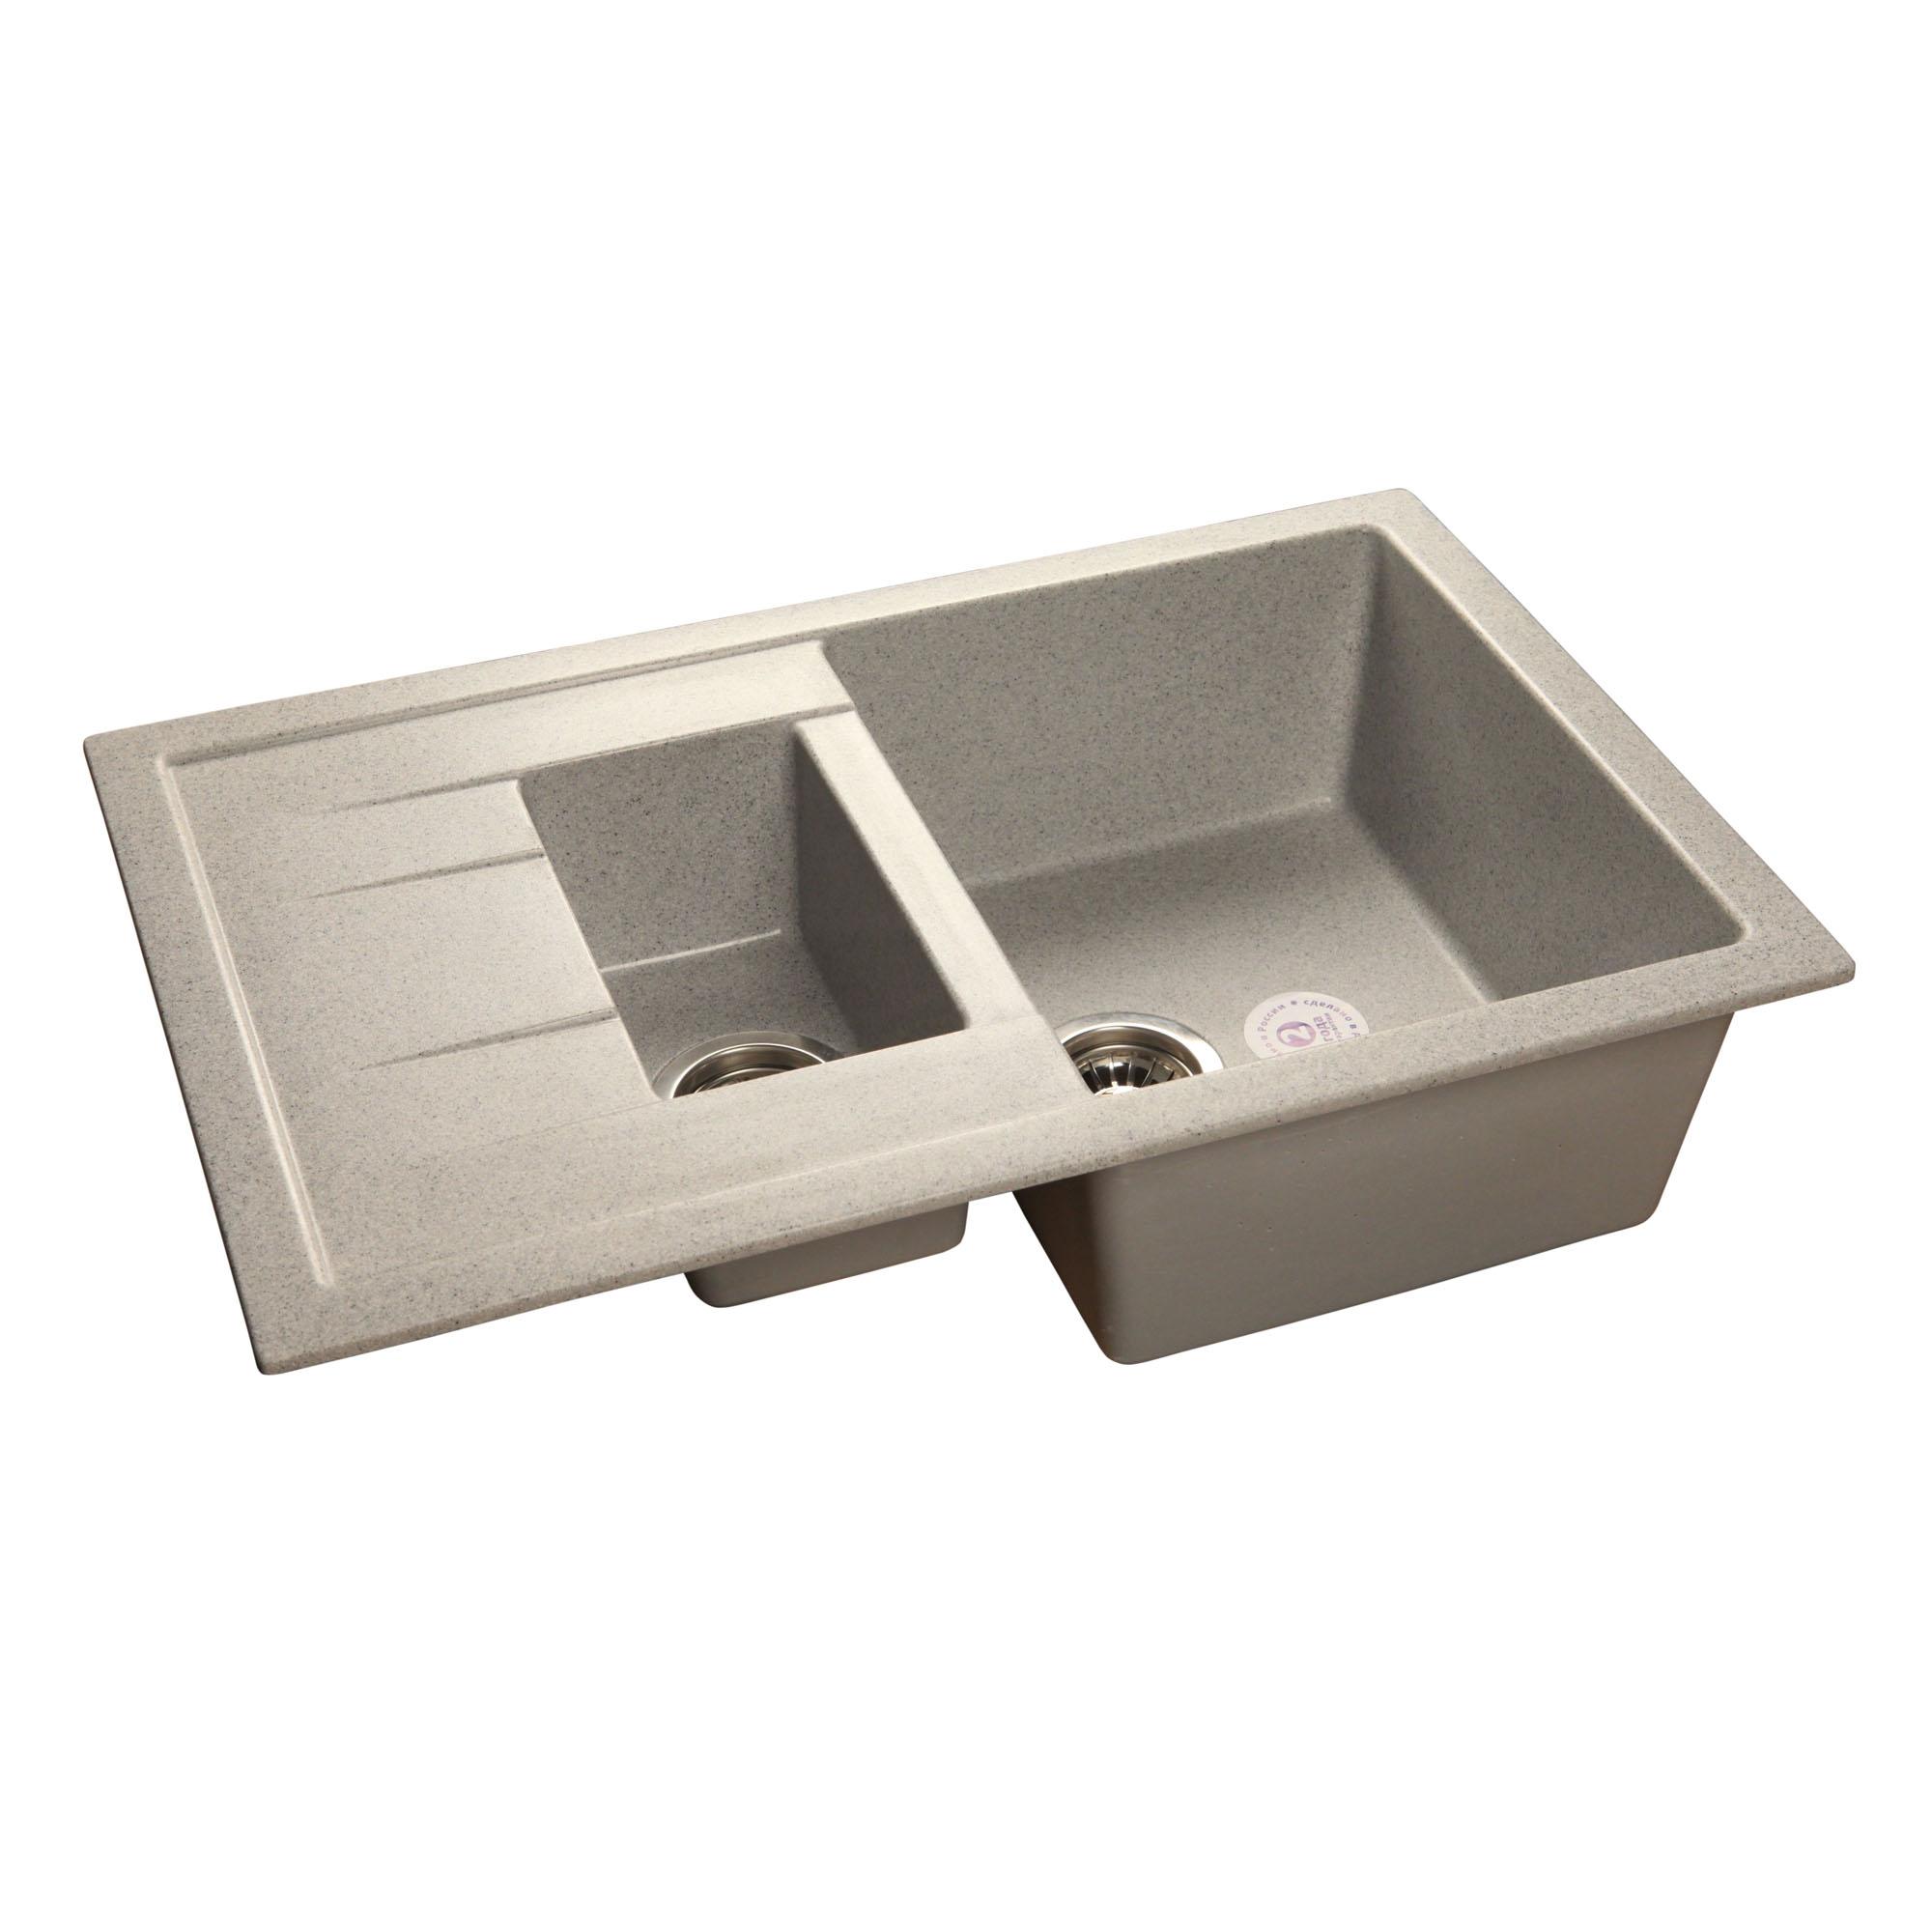 Кухонная мойка GranFest Quadro GF-Q775KL серый цена